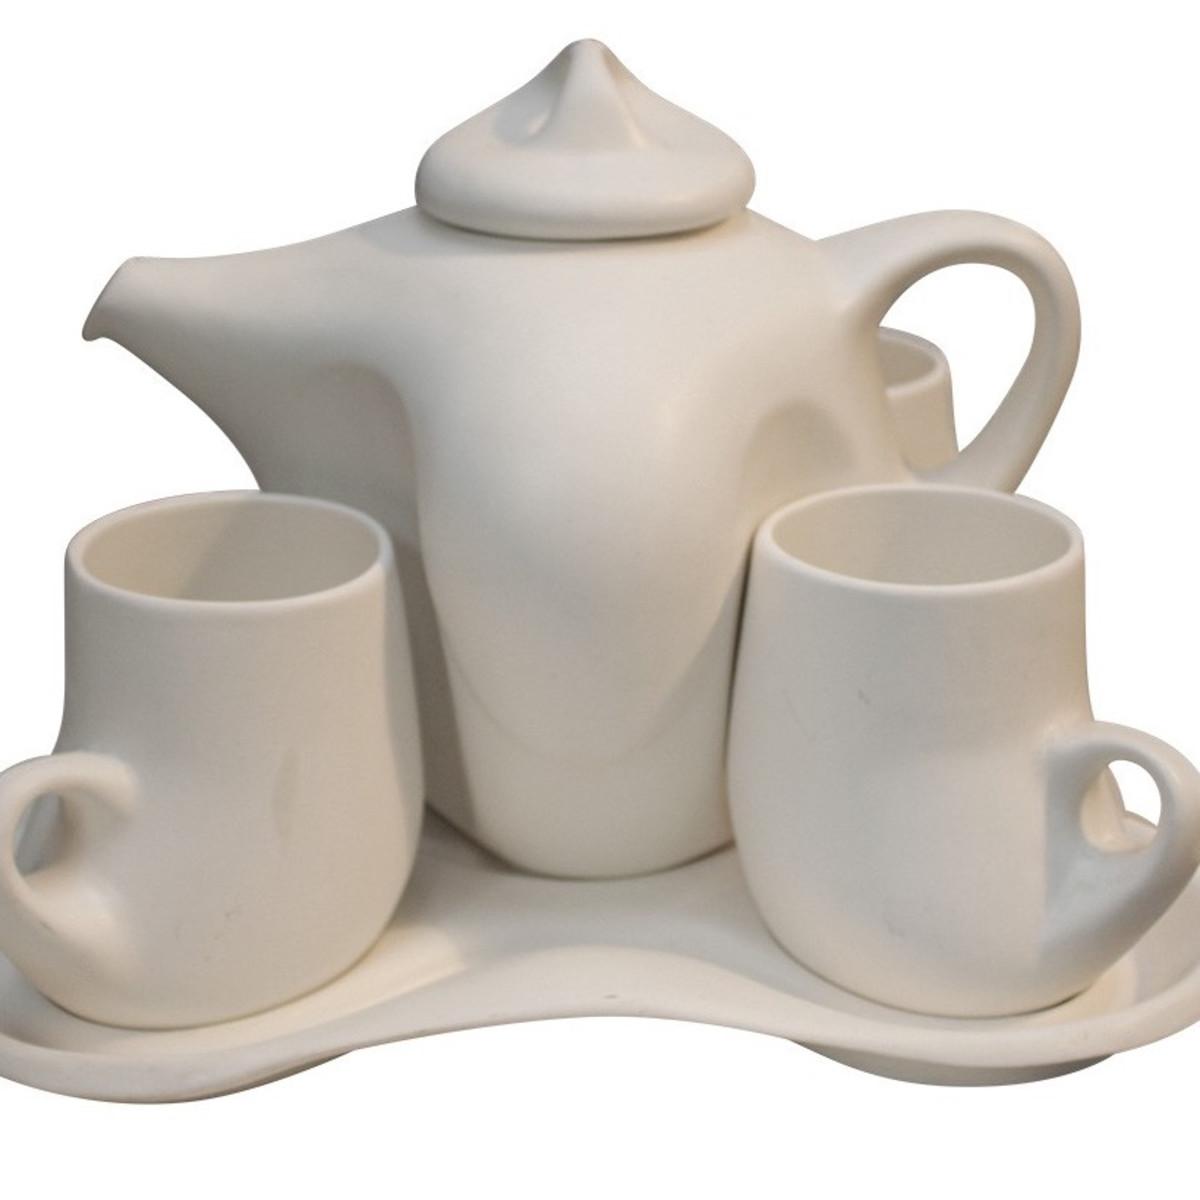 viyet tea set